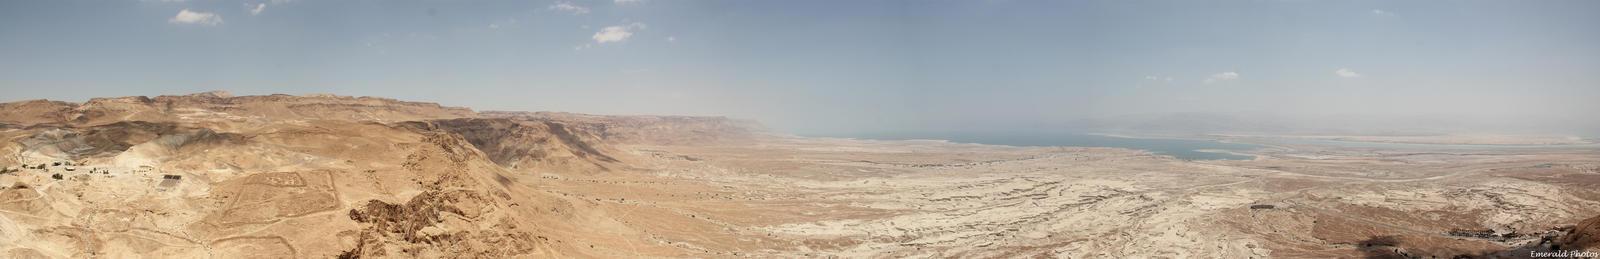 Masada Panorama by greenjinjo